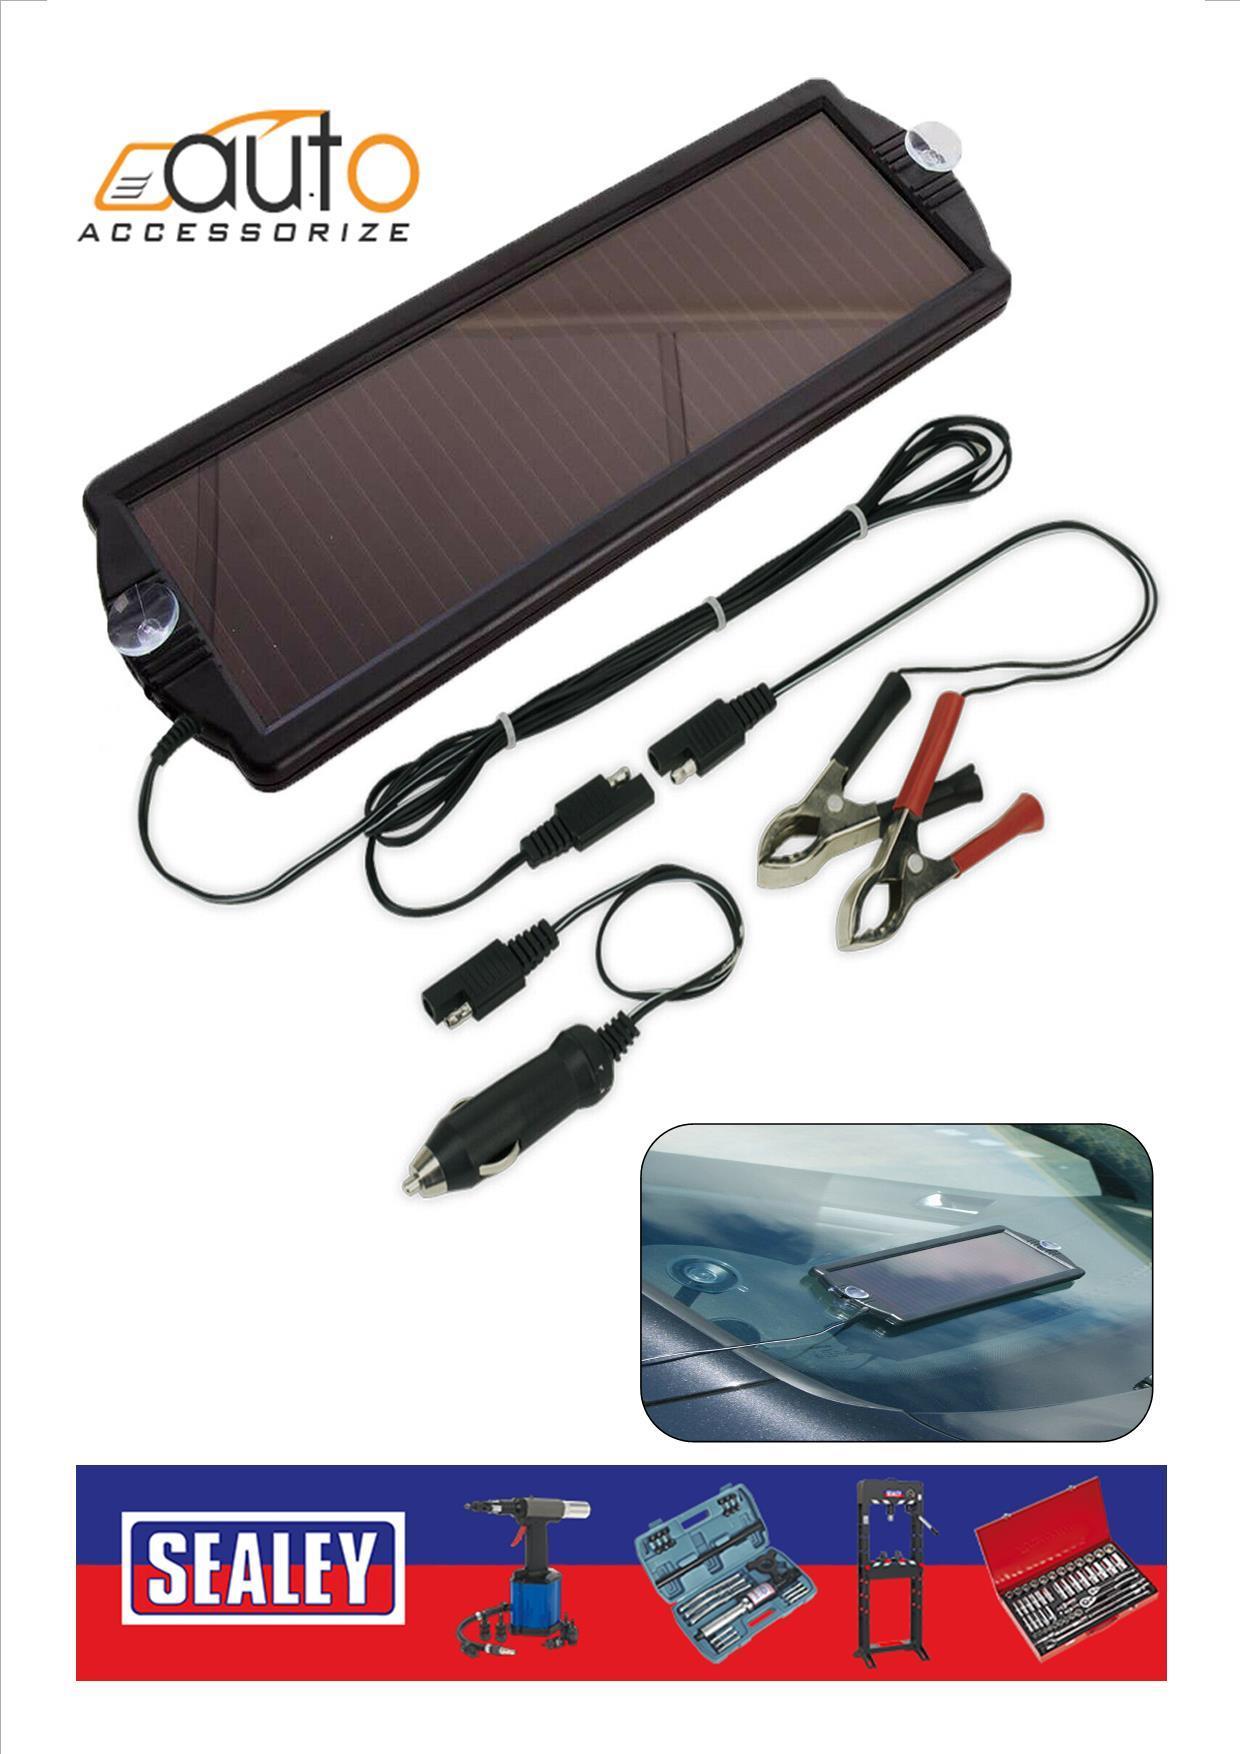 12v Solar Power Trickle Charger Car Van Motorhome Leisure Battery